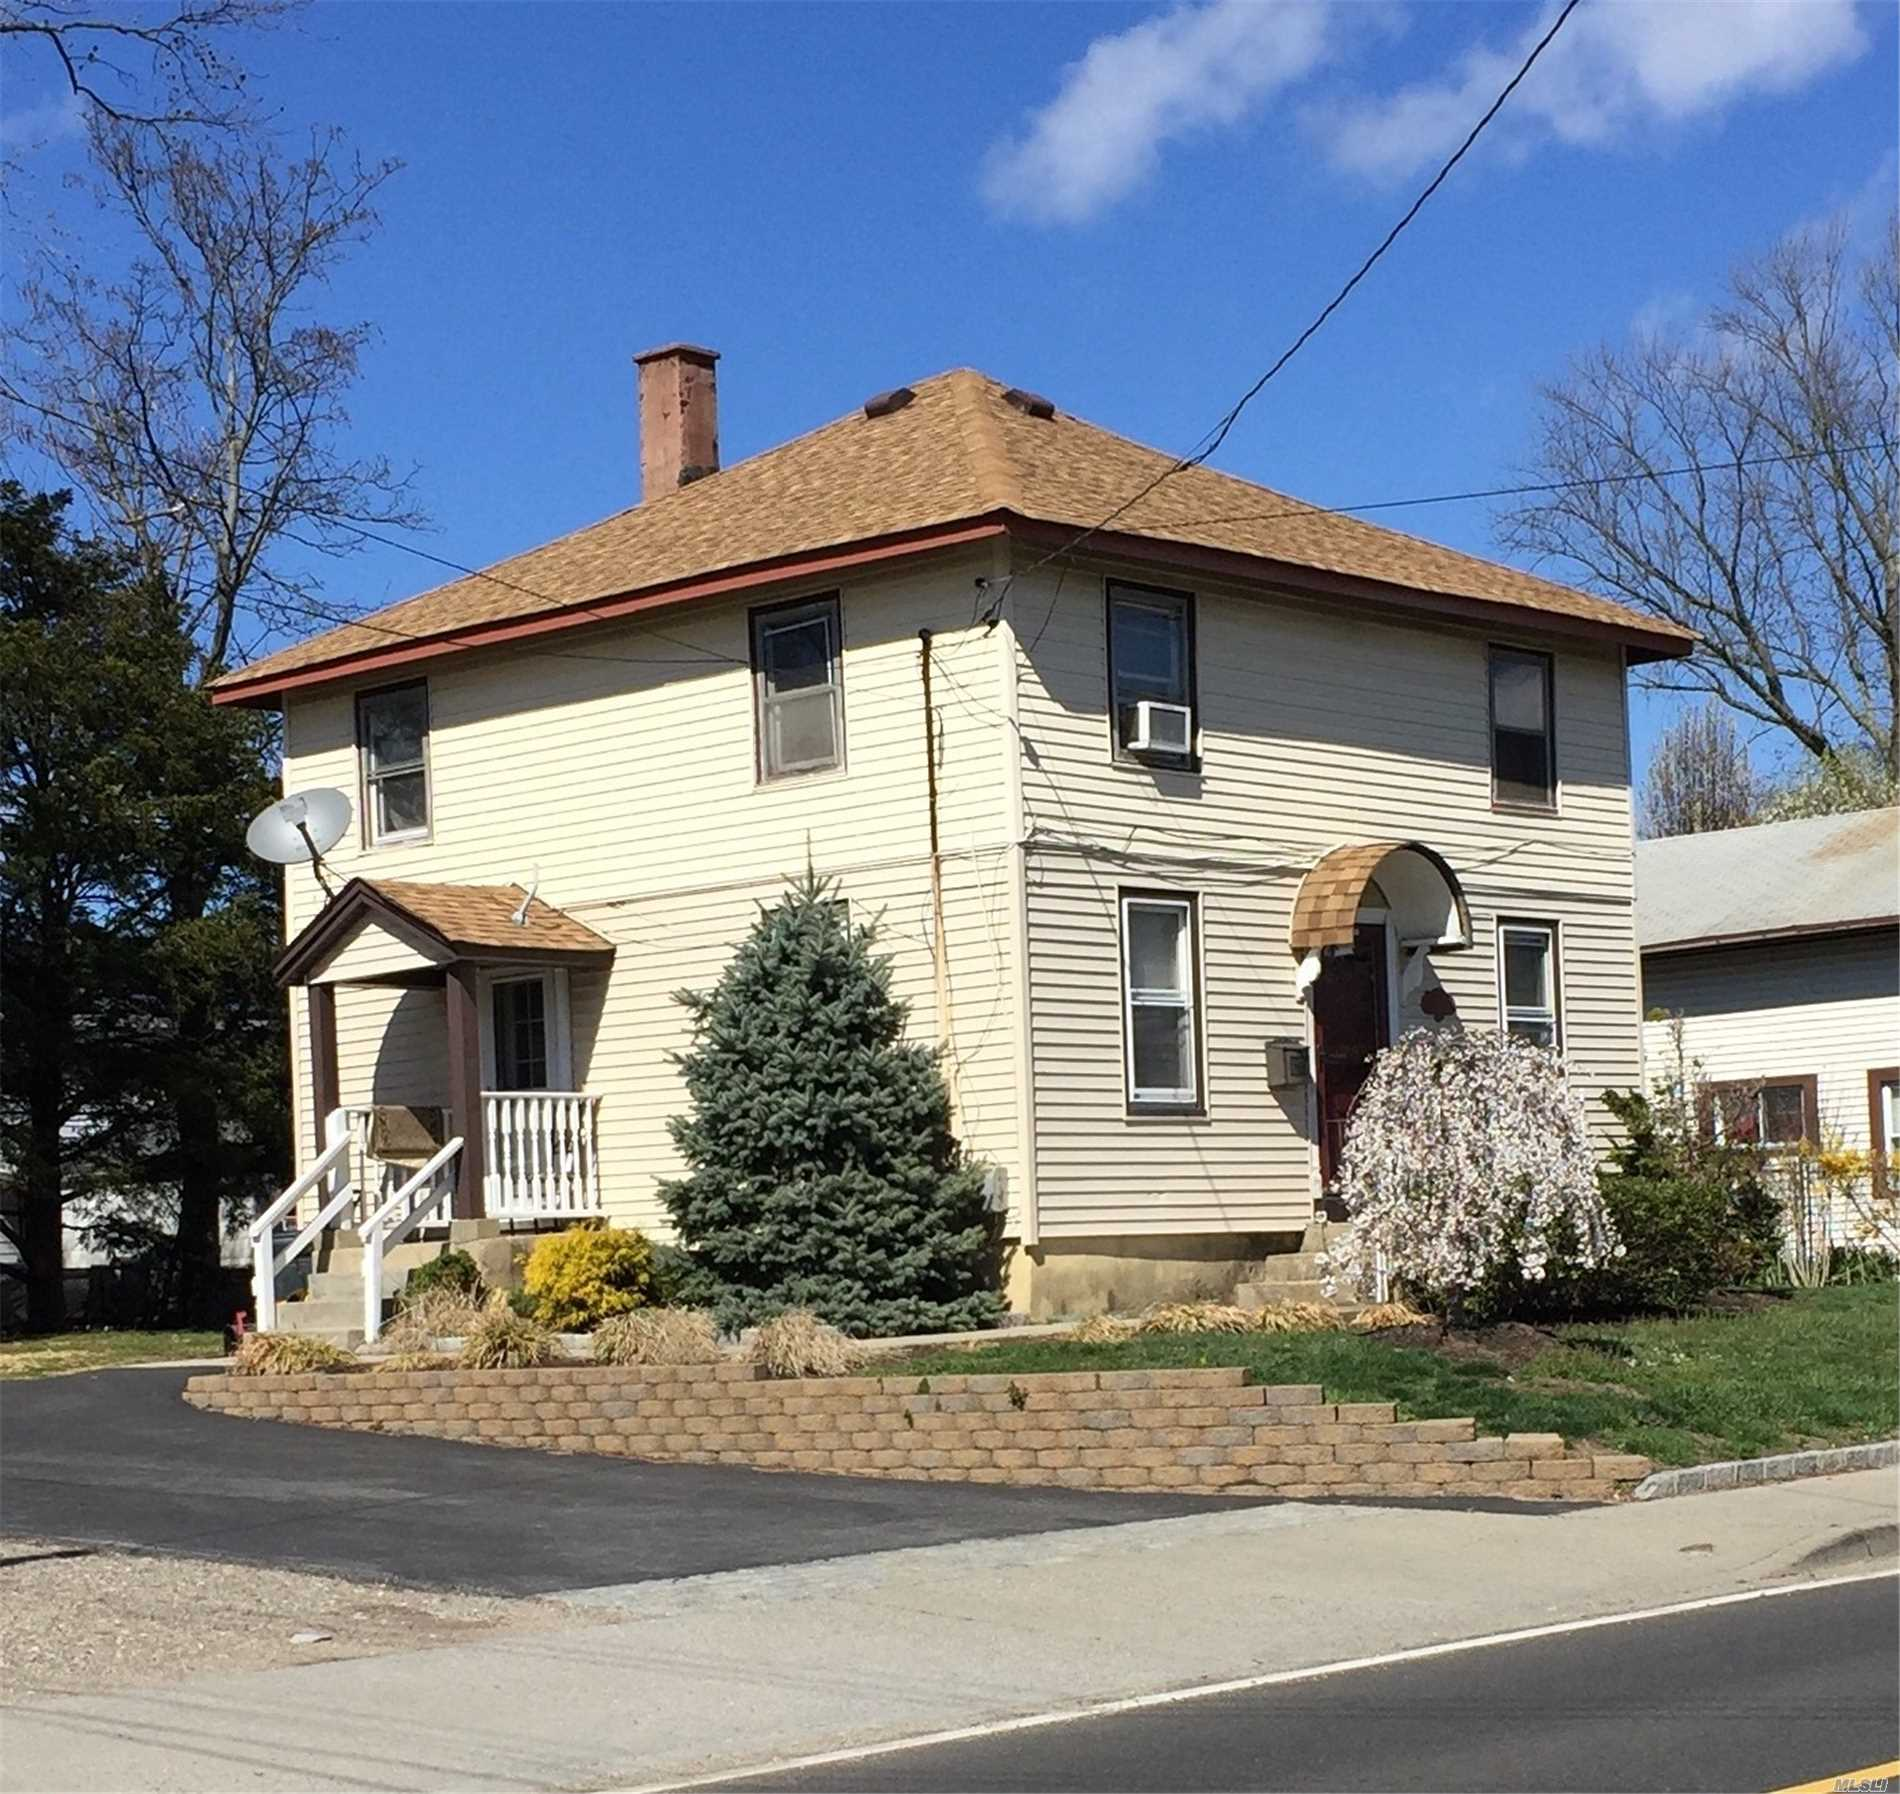 132 E Pulaski Rd - Huntington Sta, New York